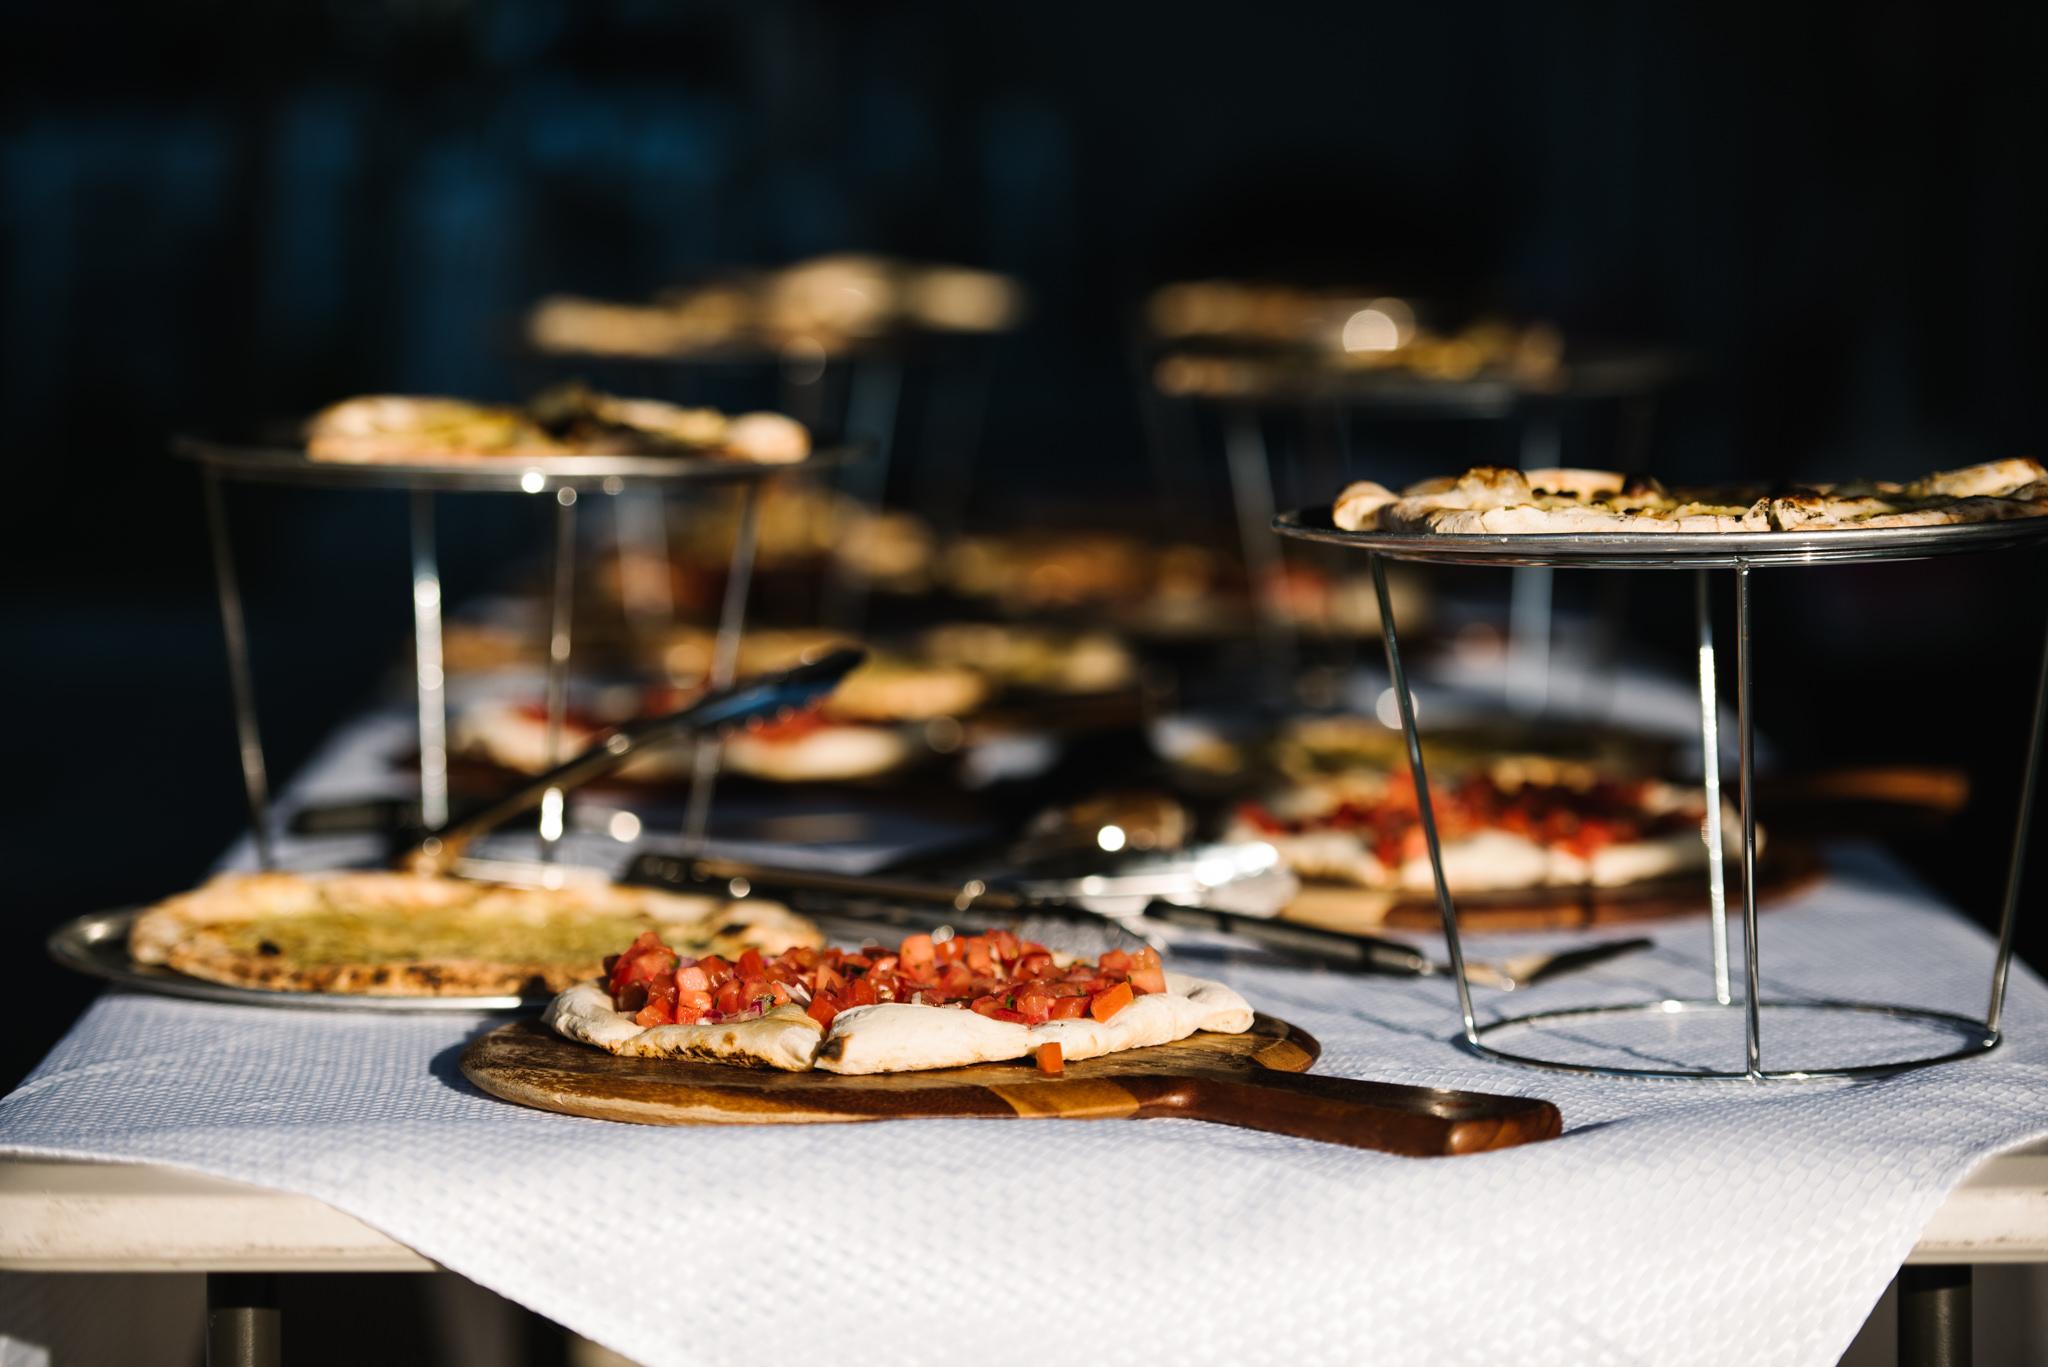 Woodfire pizza at wedding.jpg